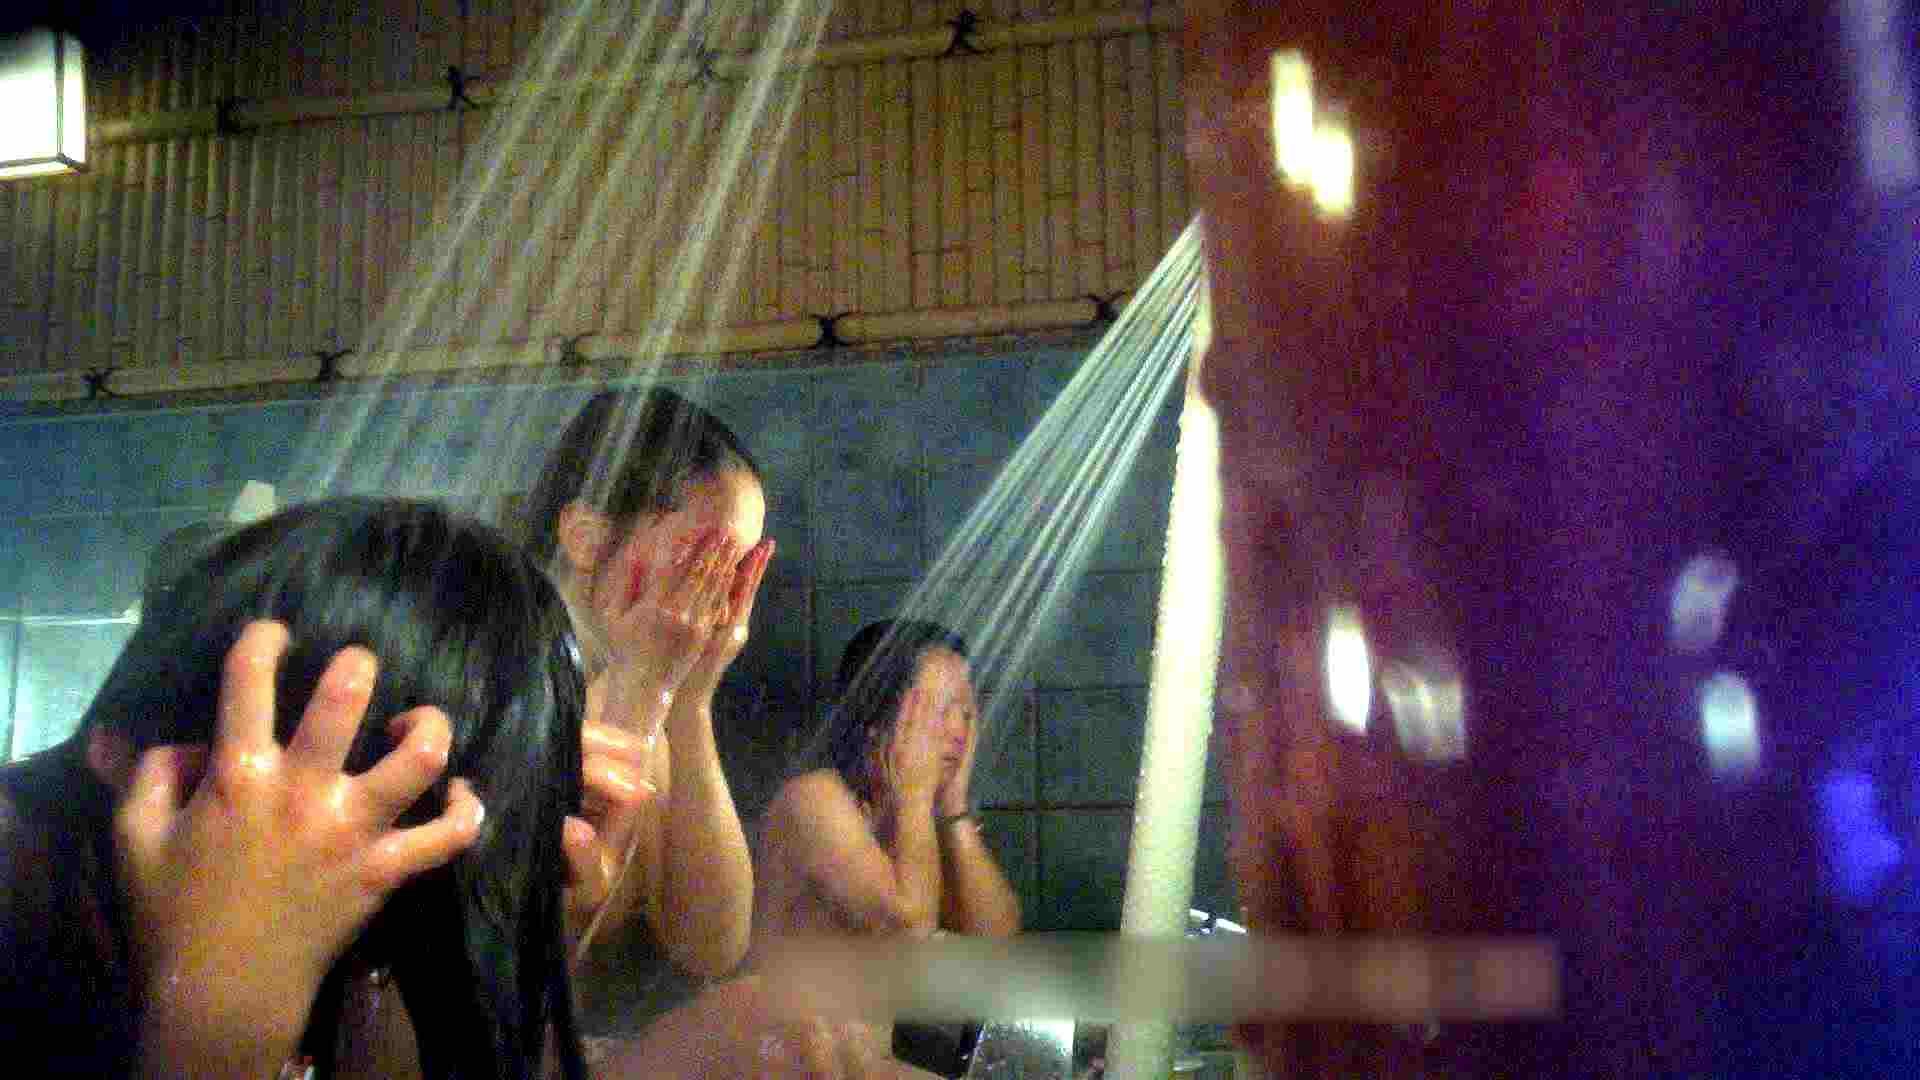 TG.12 【上等兵】いやぁ若い!ぷっちぷちギャル!でも時間短い・・・ 貧乳フェチへ オマンコ動画キャプチャ 106枚 16